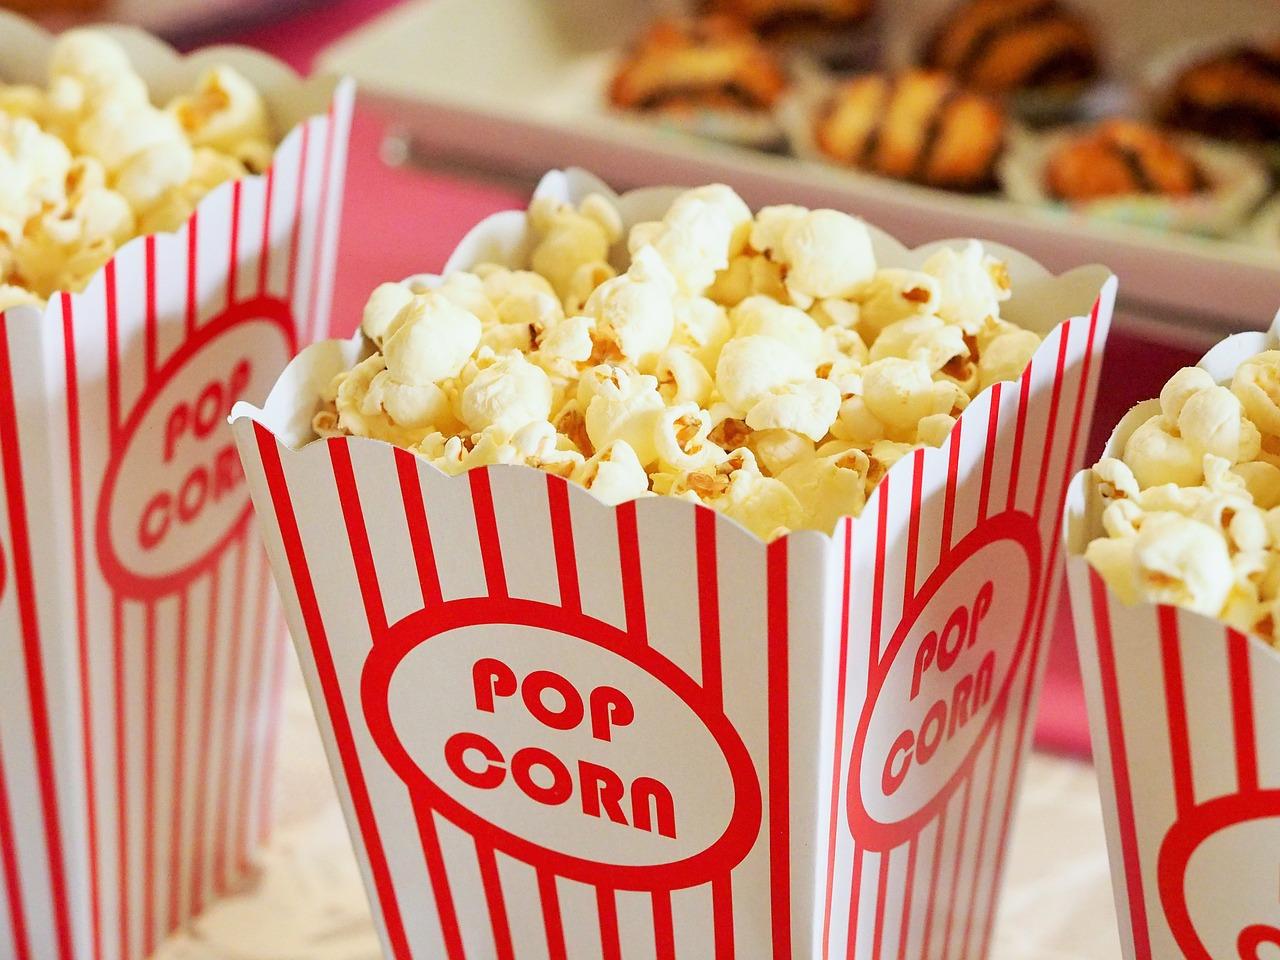 activități de iarnă activități de iarnă Activități de iarnă care alungă plictiseala popcorn 1085072 1280